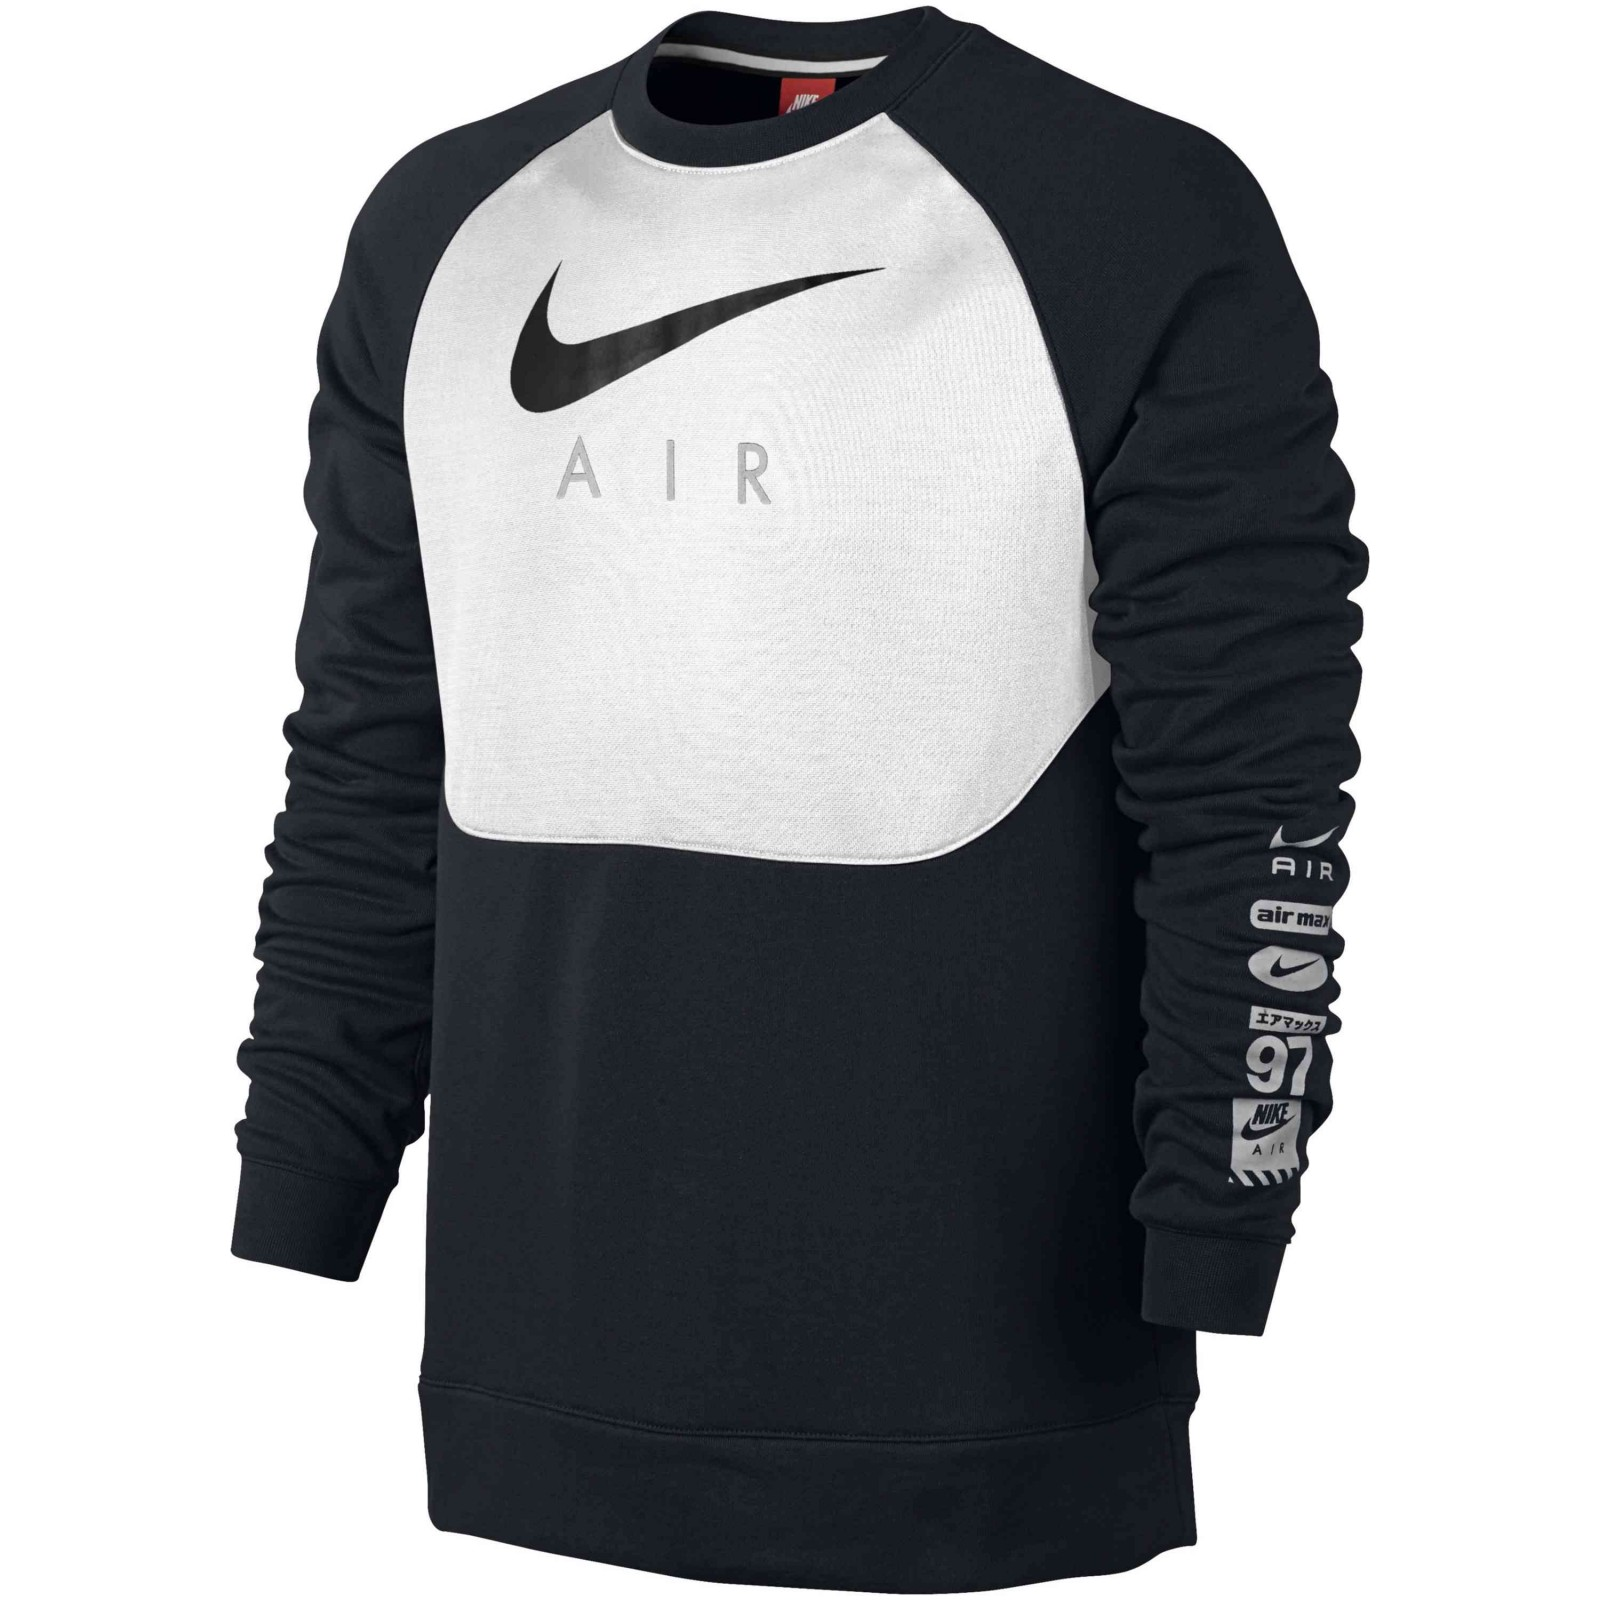 Pánská mikina Nike M NSW CRW BB AIR HYB  39f3ab4178c